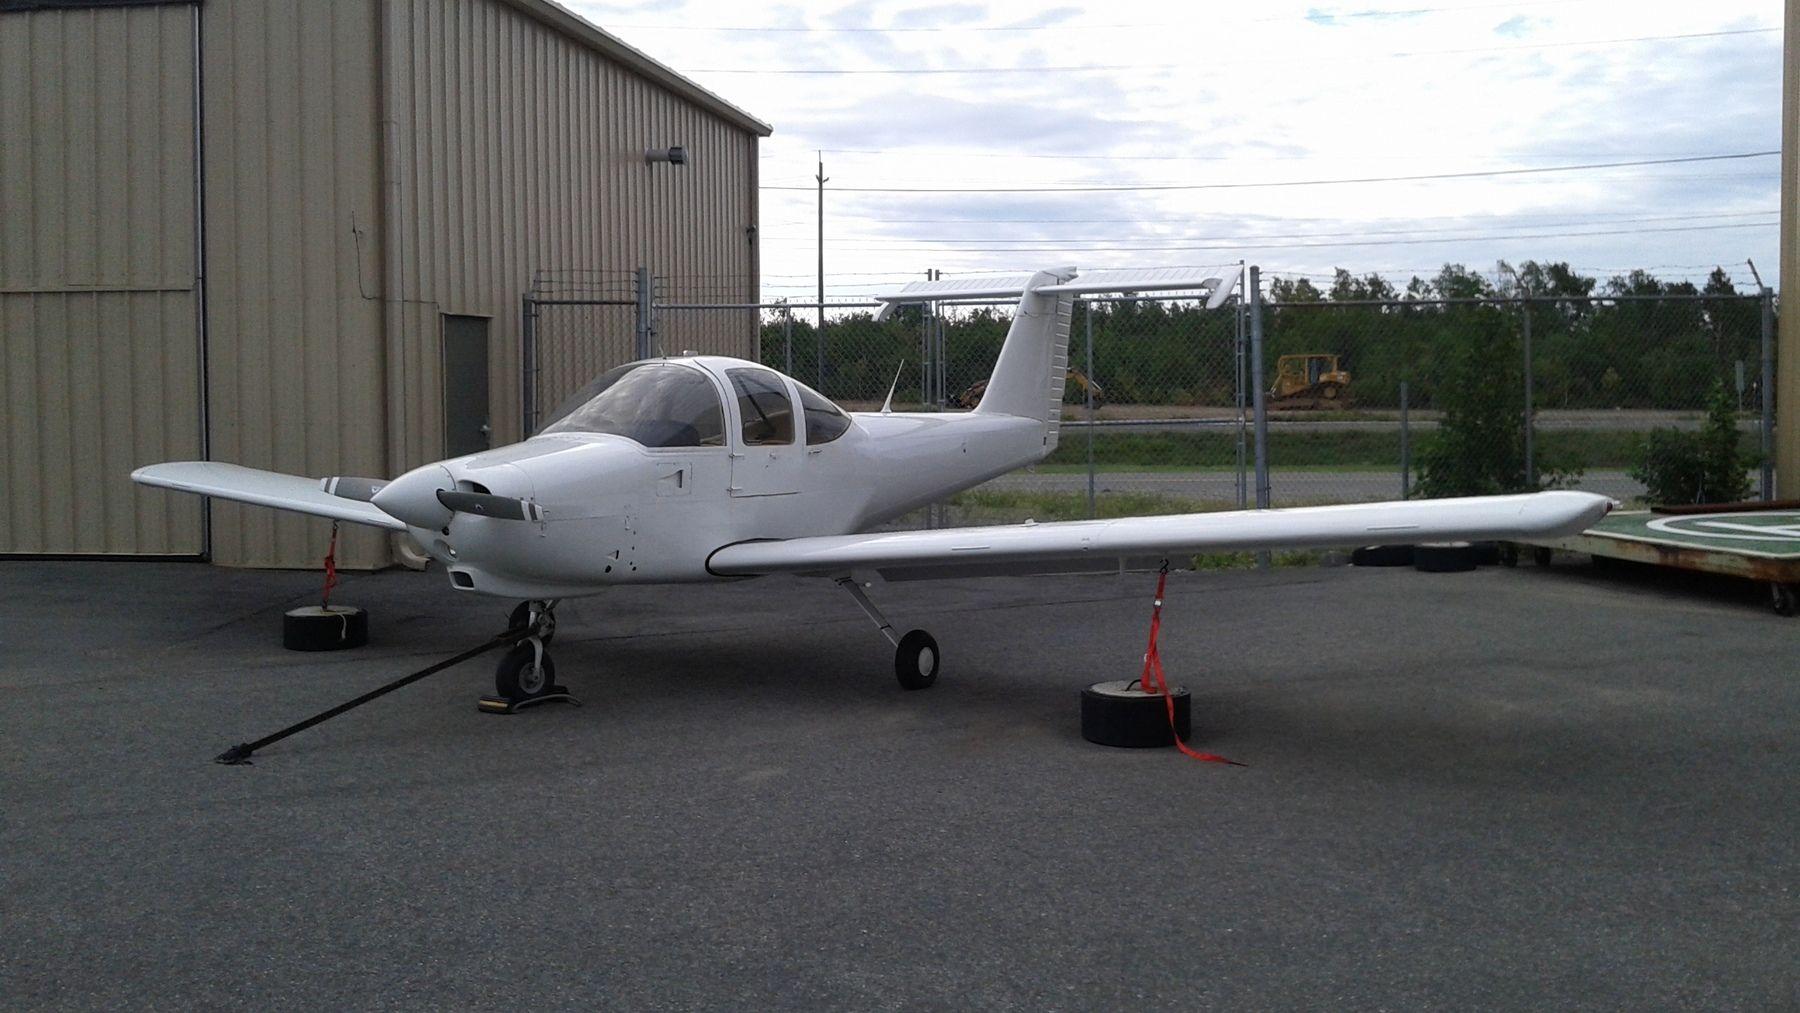 1979 Piper PA38 Tomahawk for sale in (CYSB) Sudbury